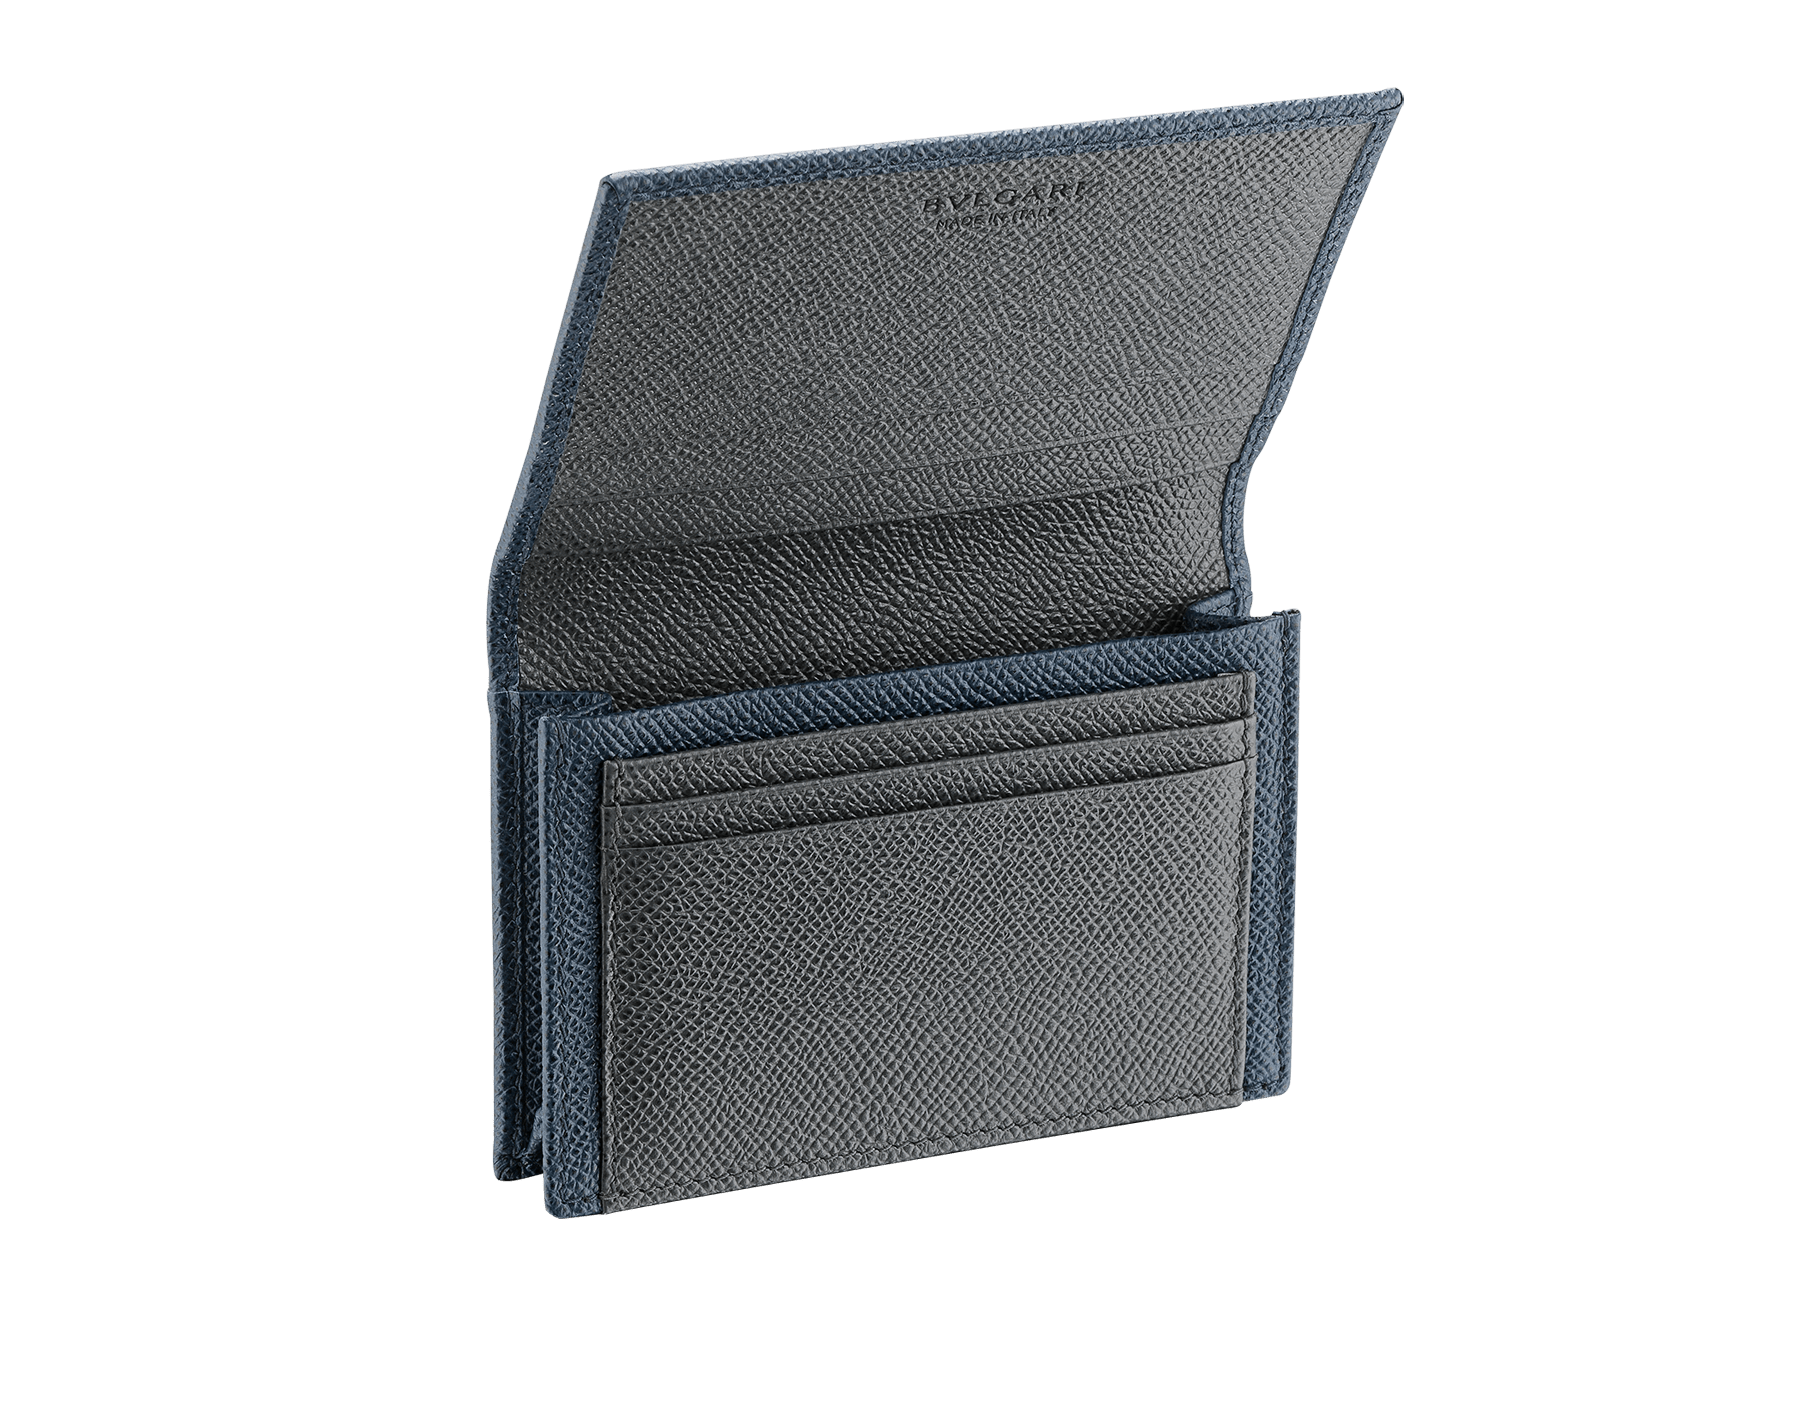 BVLGARI BVLGARI business card holder in denim sapphire and charcoal diamond grain calf leather, with brass palladium plated logo decoration. 289116 image 2